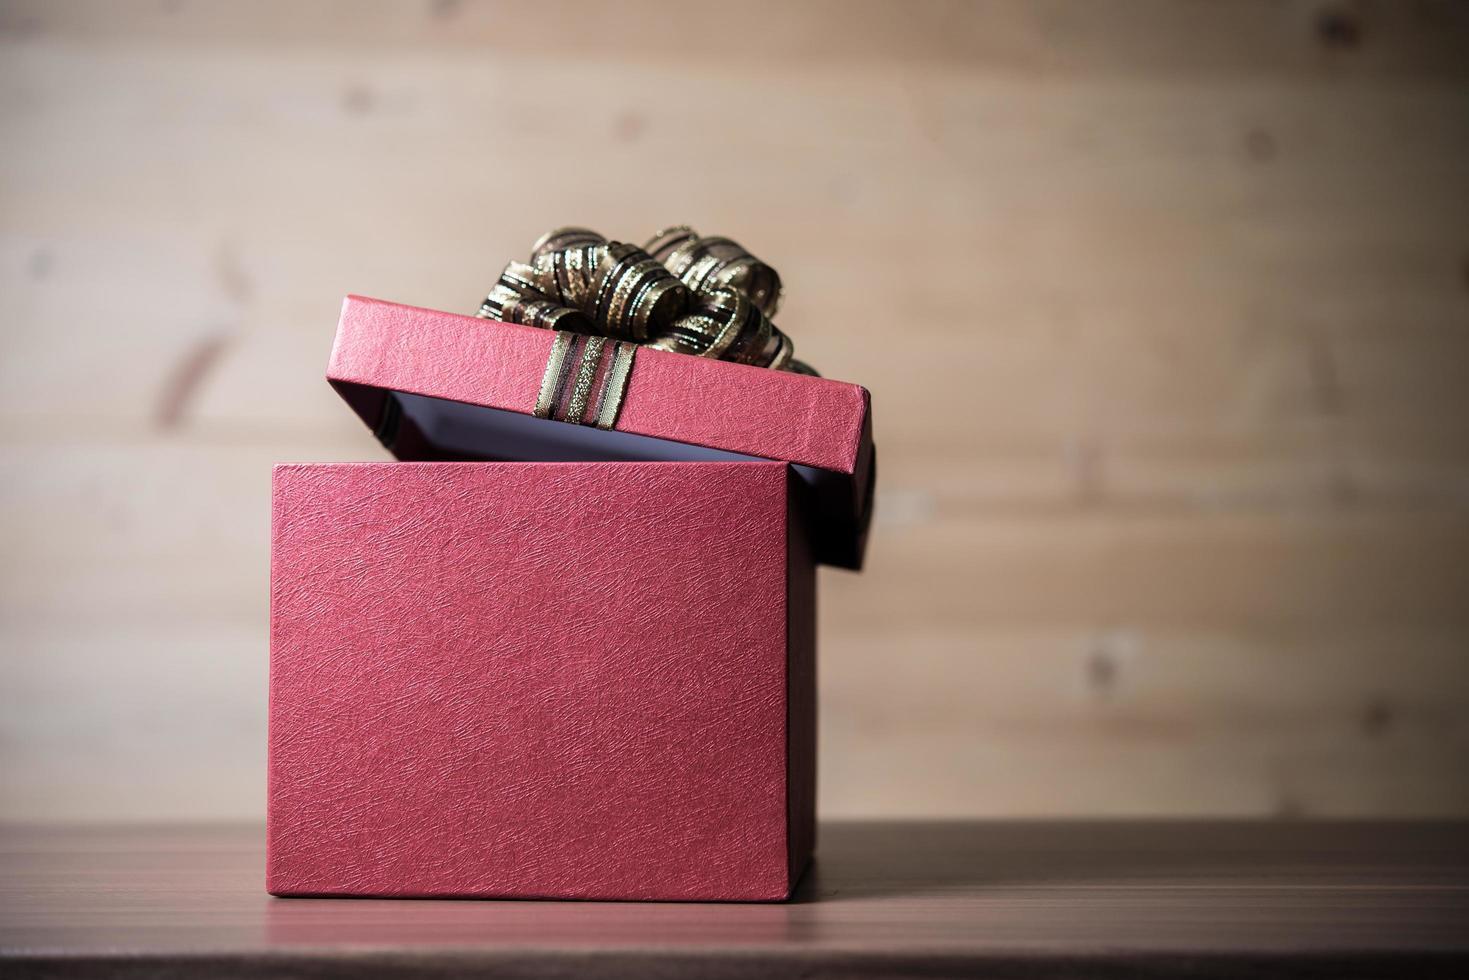 caja de regalo sobre fondo de madera foto